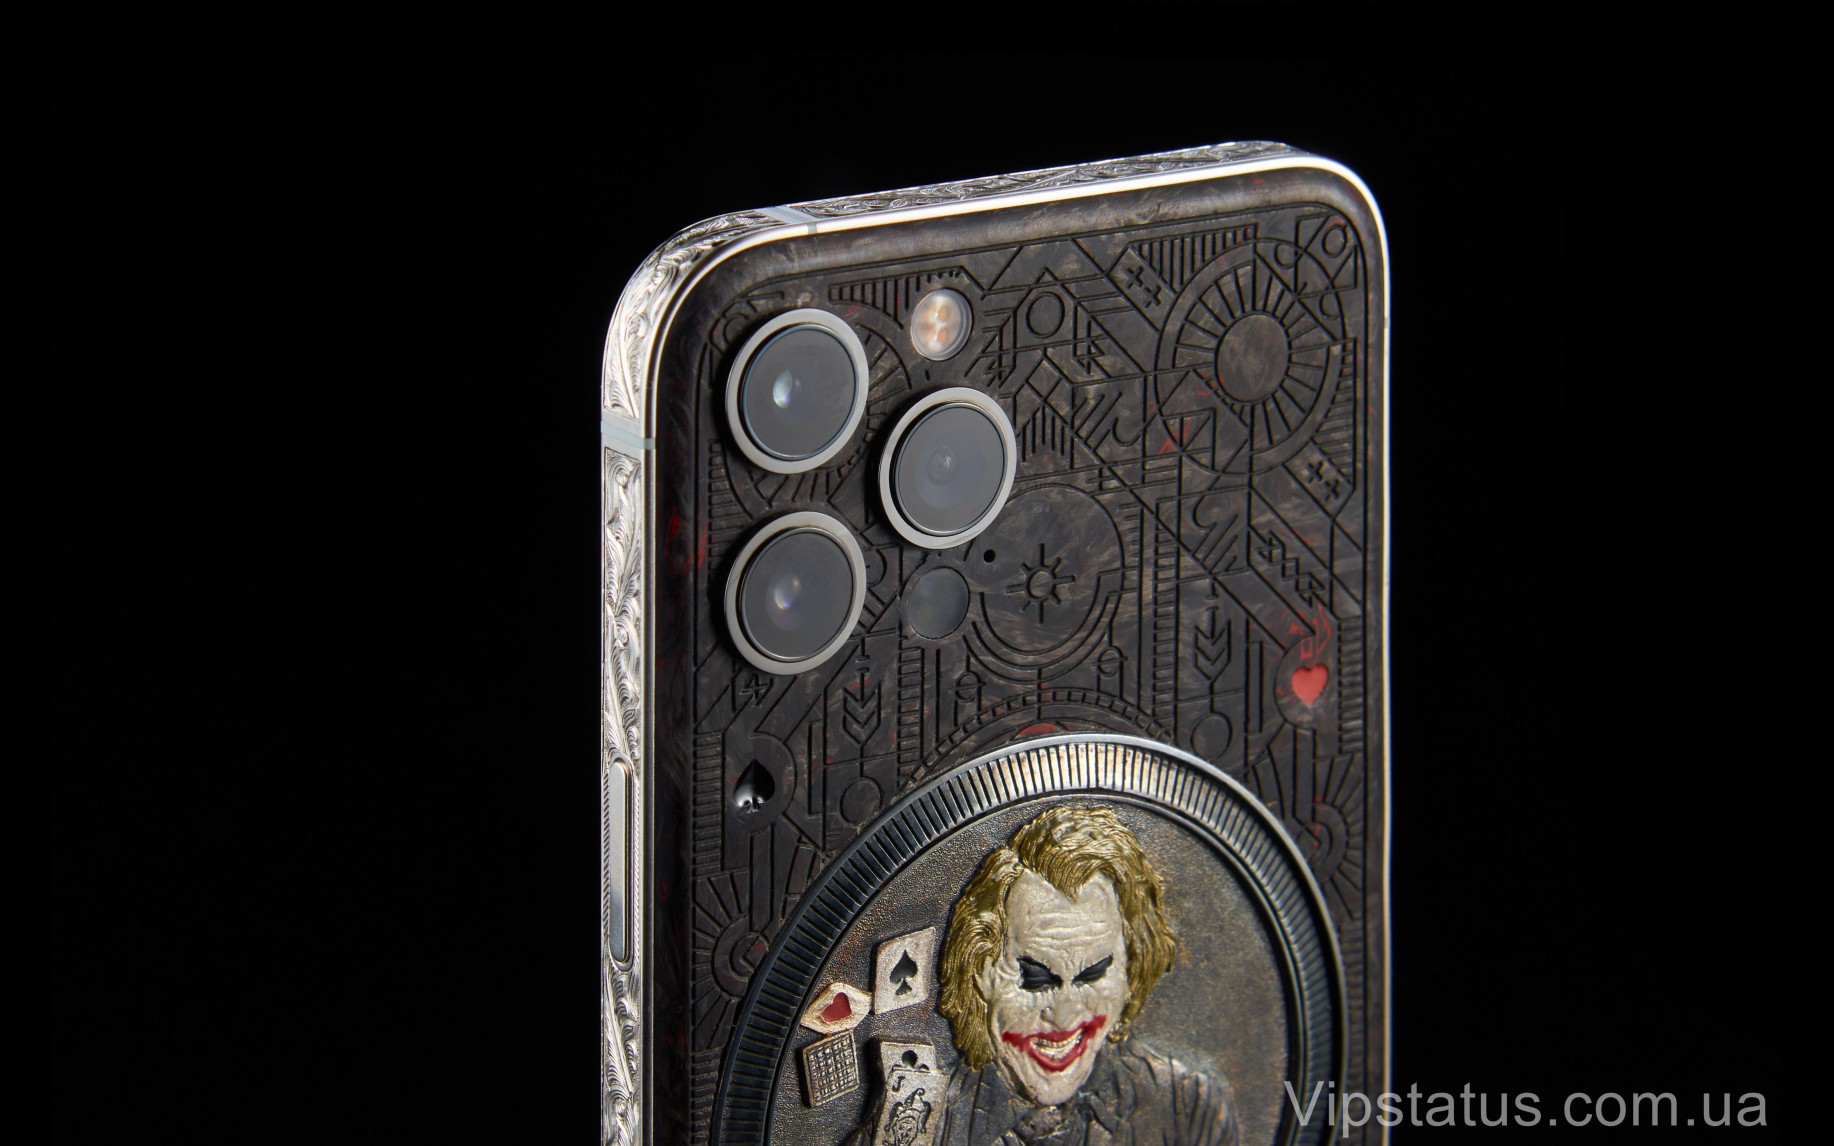 Elite Dark Joker IPHONE 13 PRO MAX 512 GB Dark Joker IPHONE 13 PRO MAX 512 GB image 2